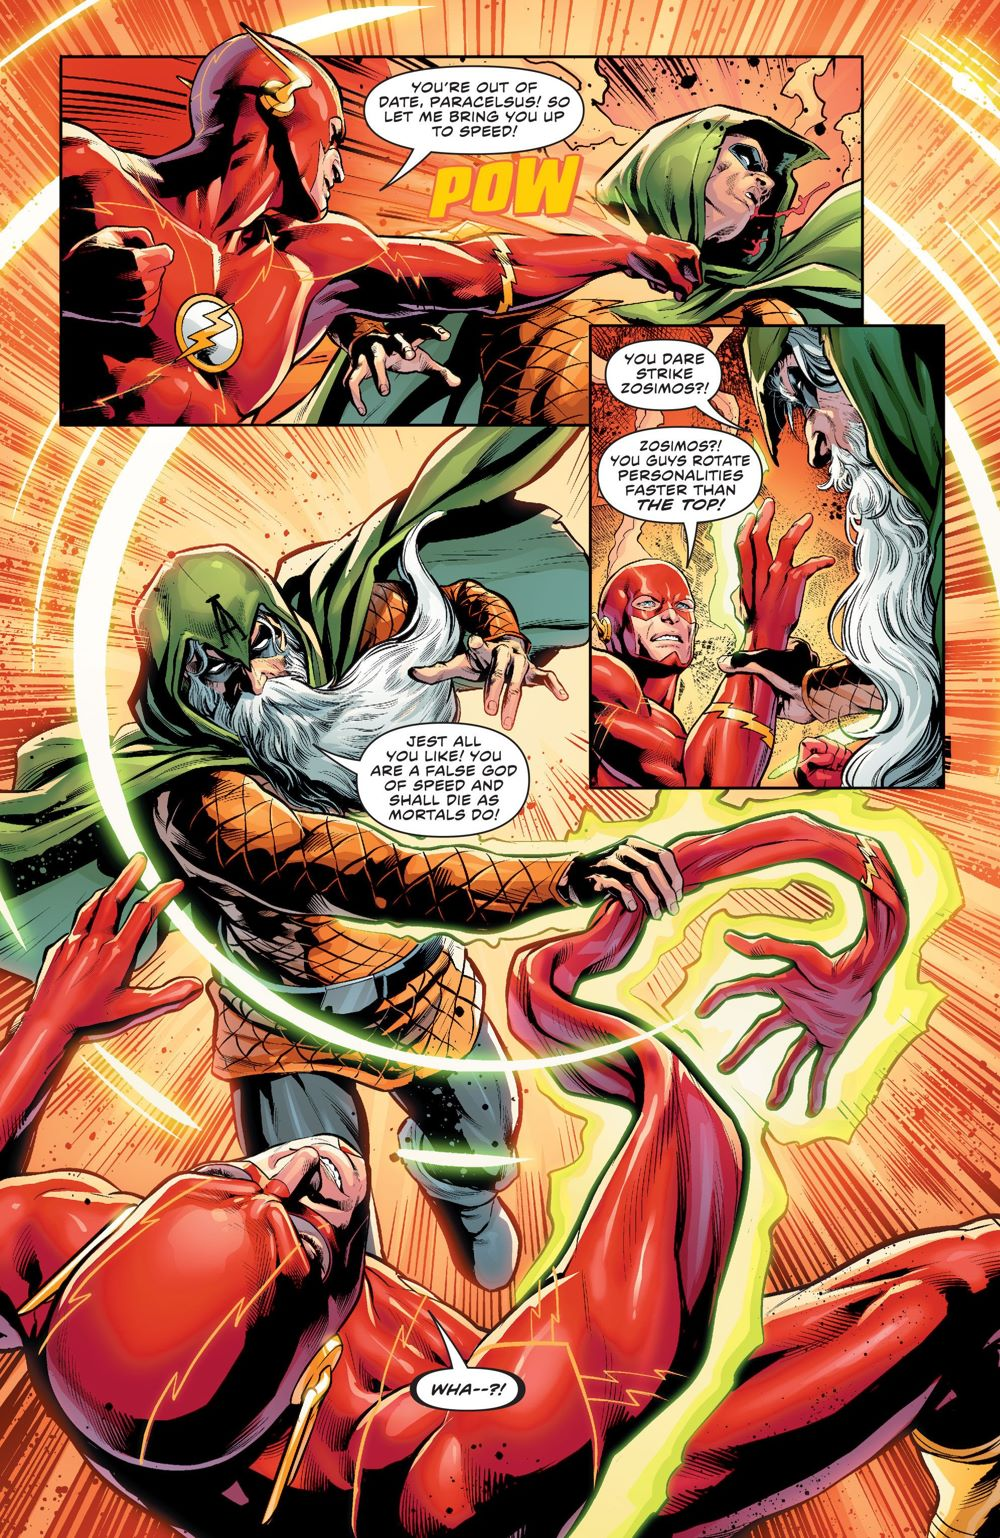 FLS-766-4 ComicList Previews: THE FLASH #766